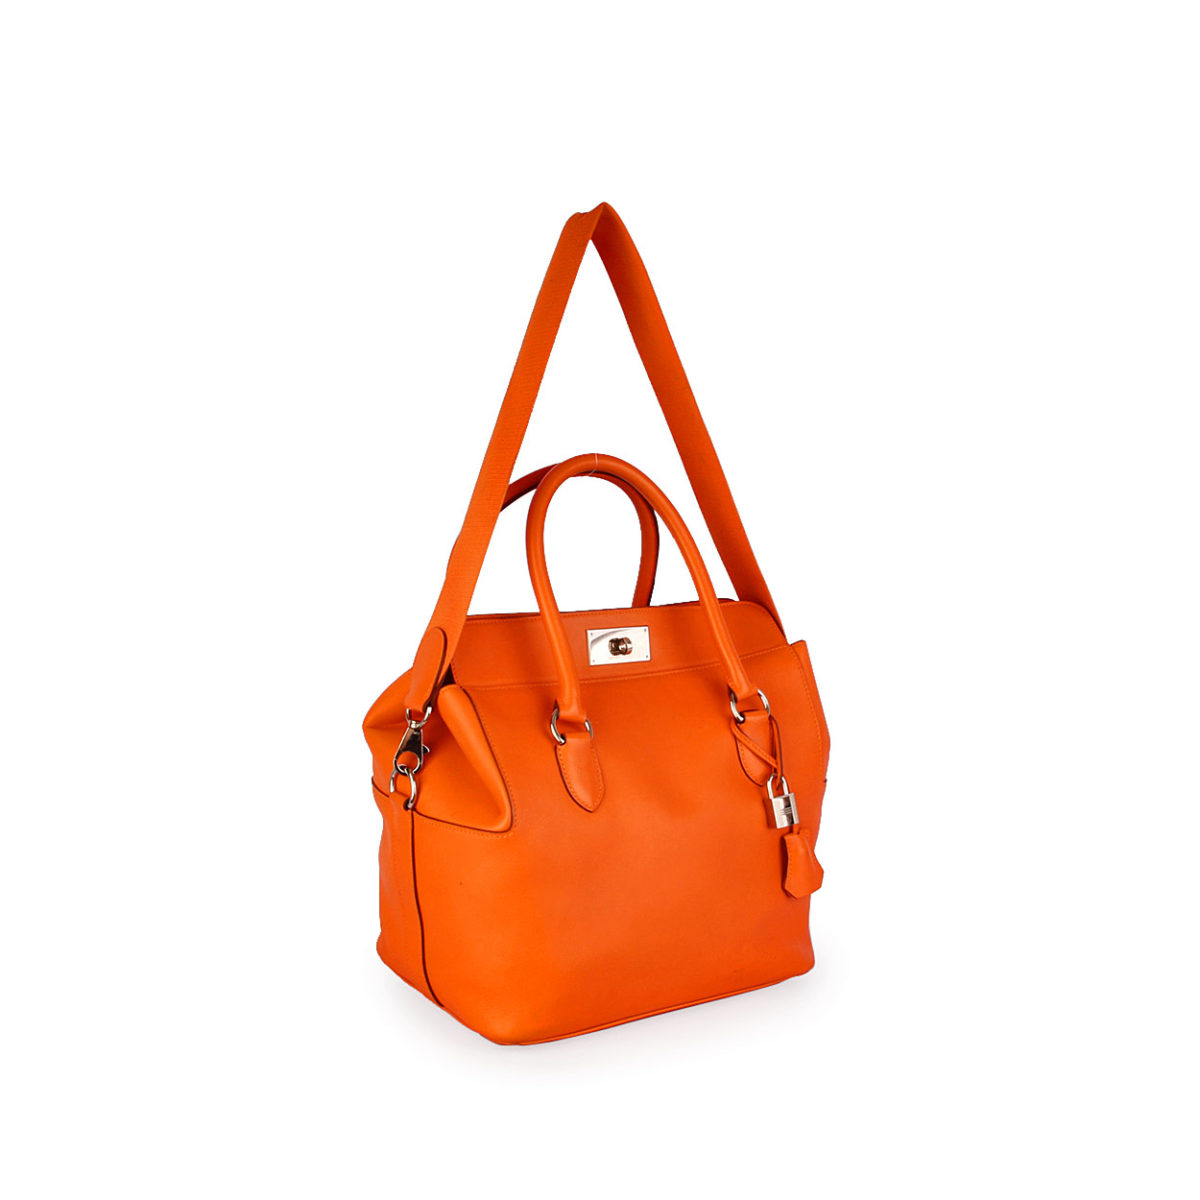 6db87c1355c HERMES Swift Leather Toolbox Bag 26cm Orange   Luxity